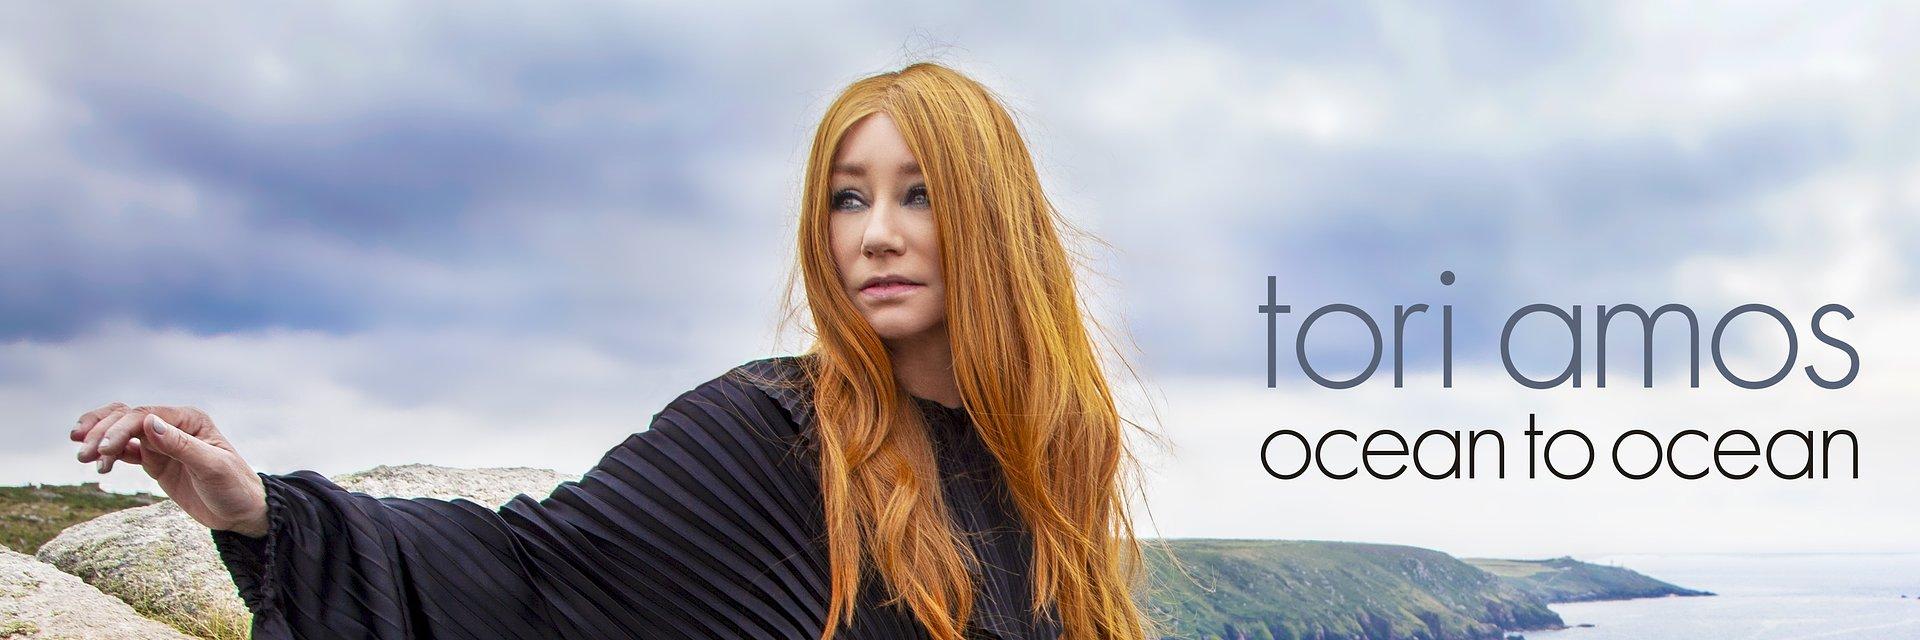 "Tori Amos ""Ocean to Ocean"". Premiera albumu 29 października"